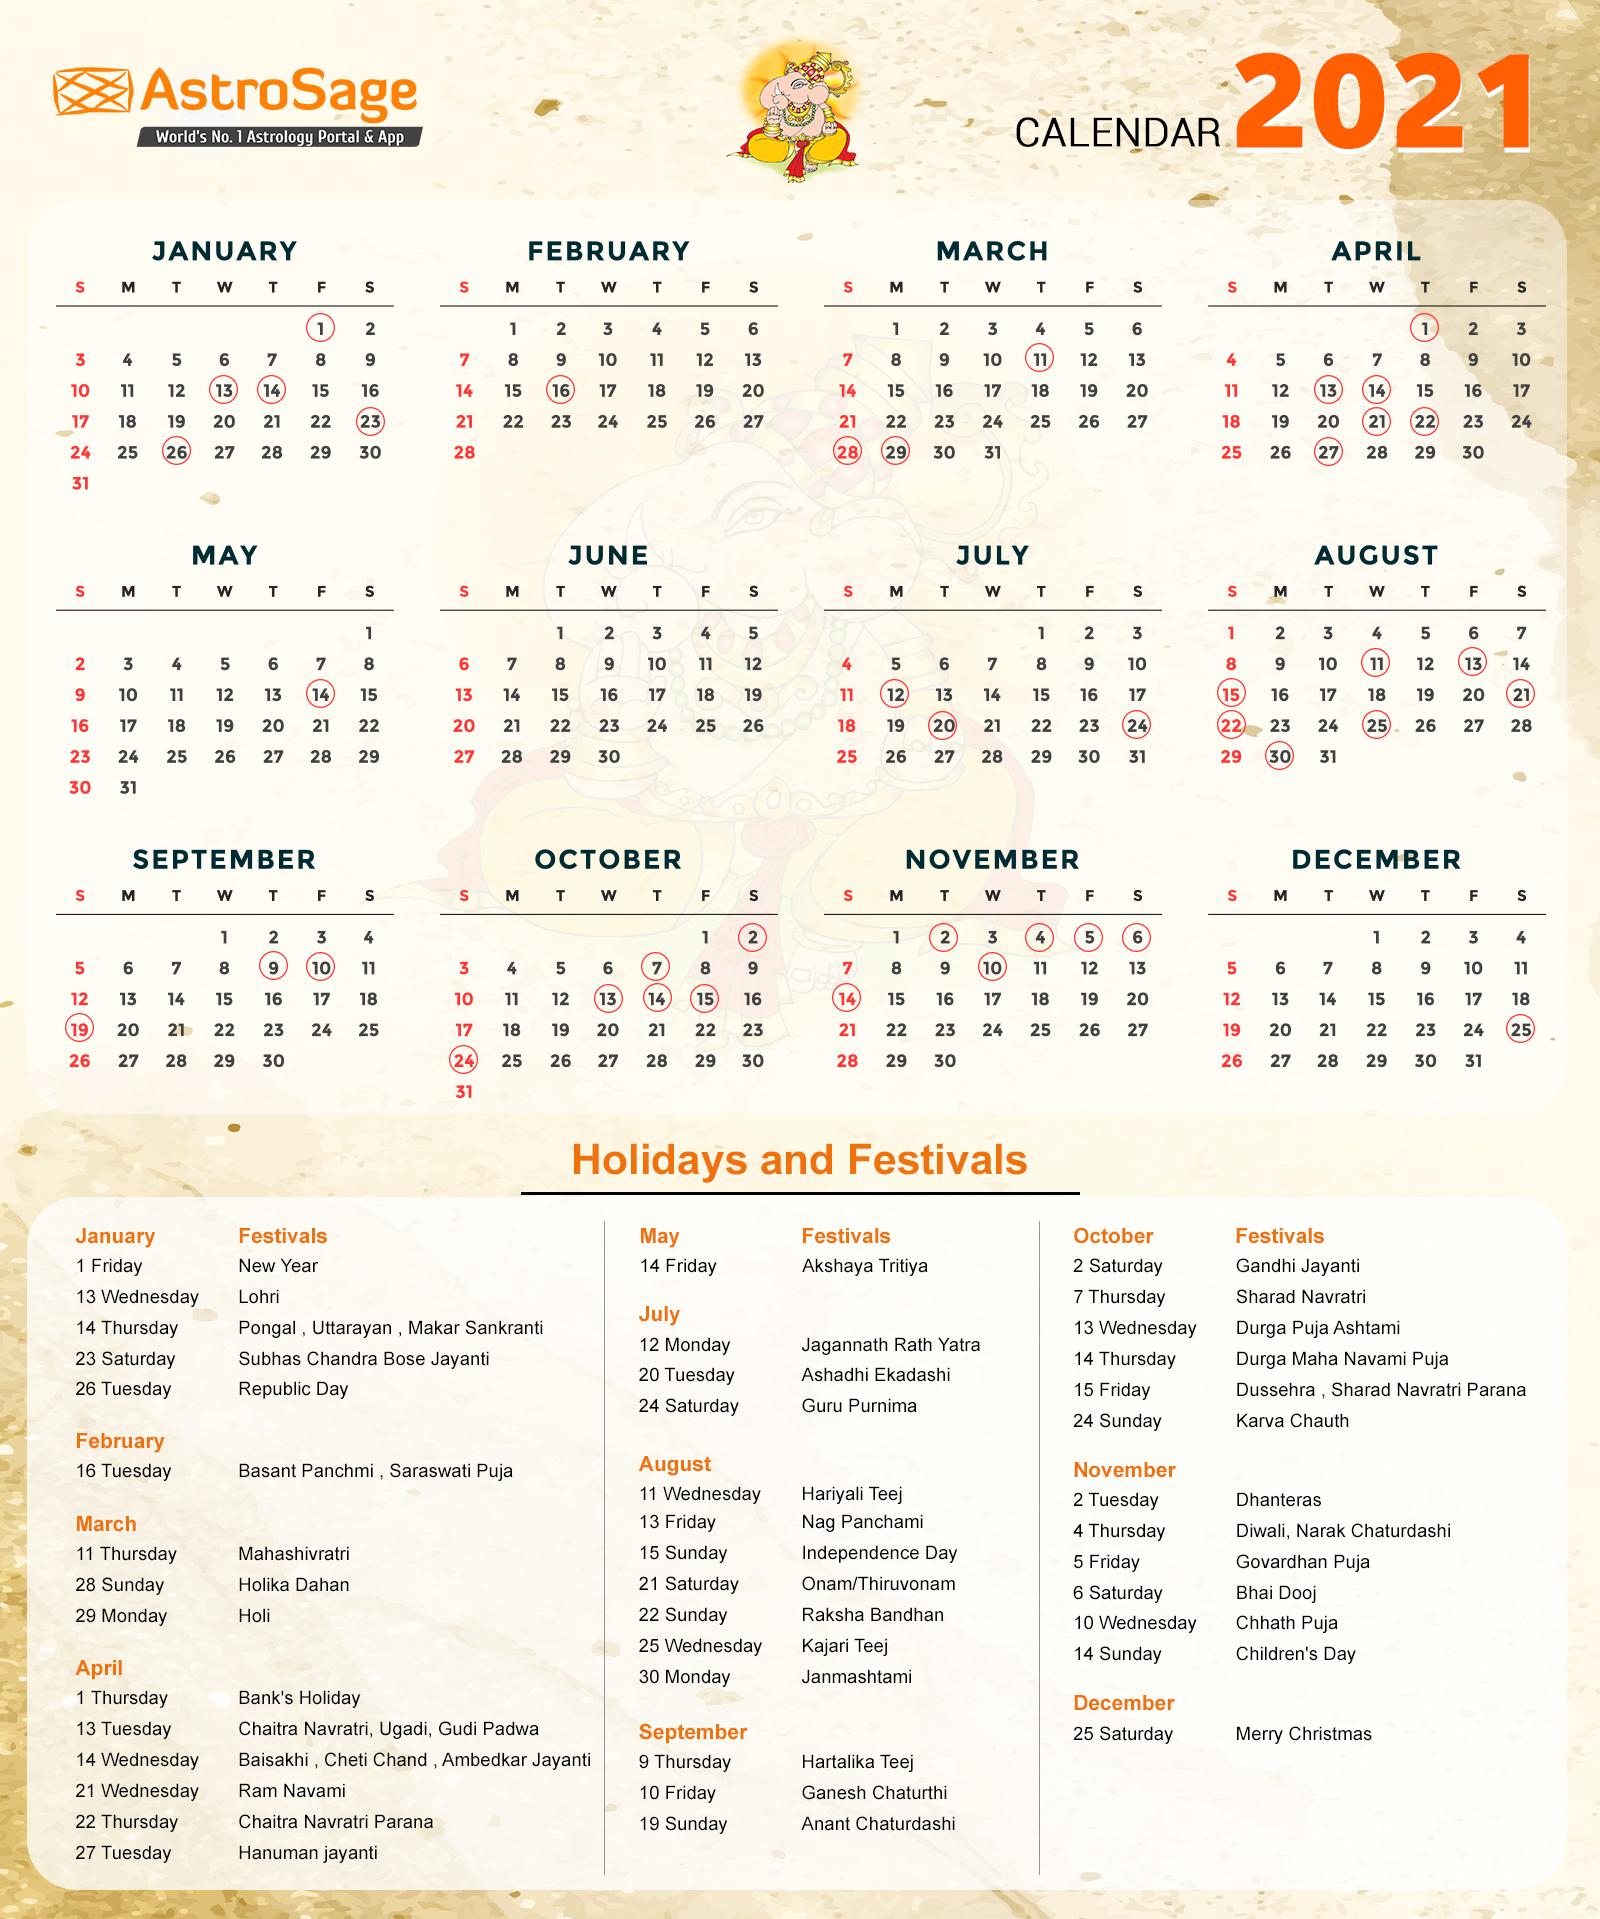 Indian Calendar 2021 - Indian Festivals & Holidays